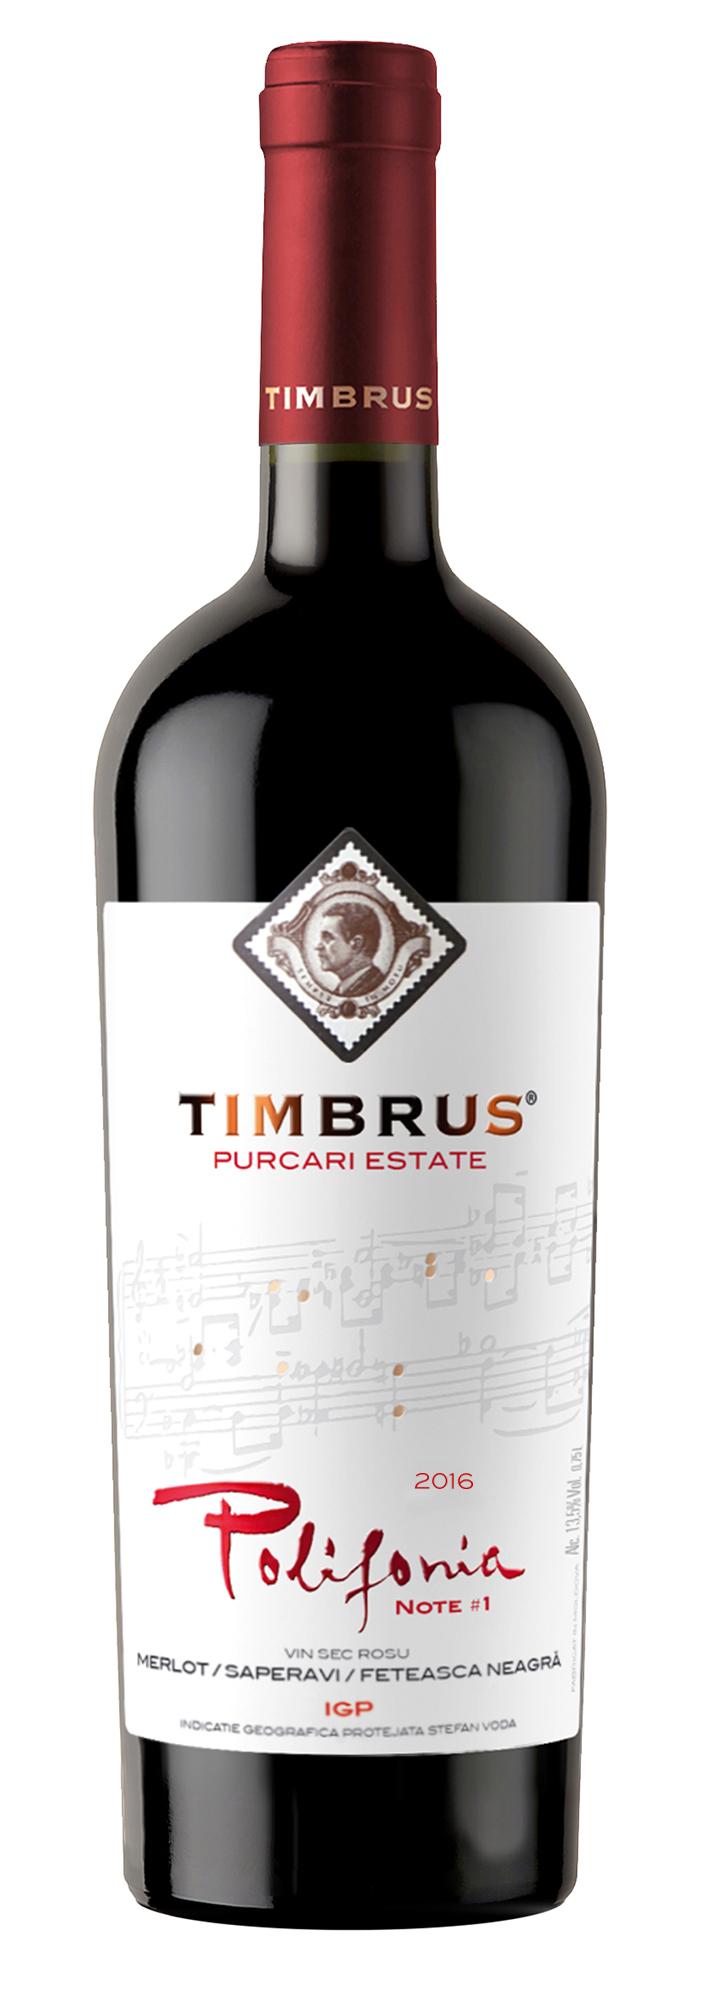 Vin rosu - Timbrus Polifonia Note 1, 2016, sec Timbrus